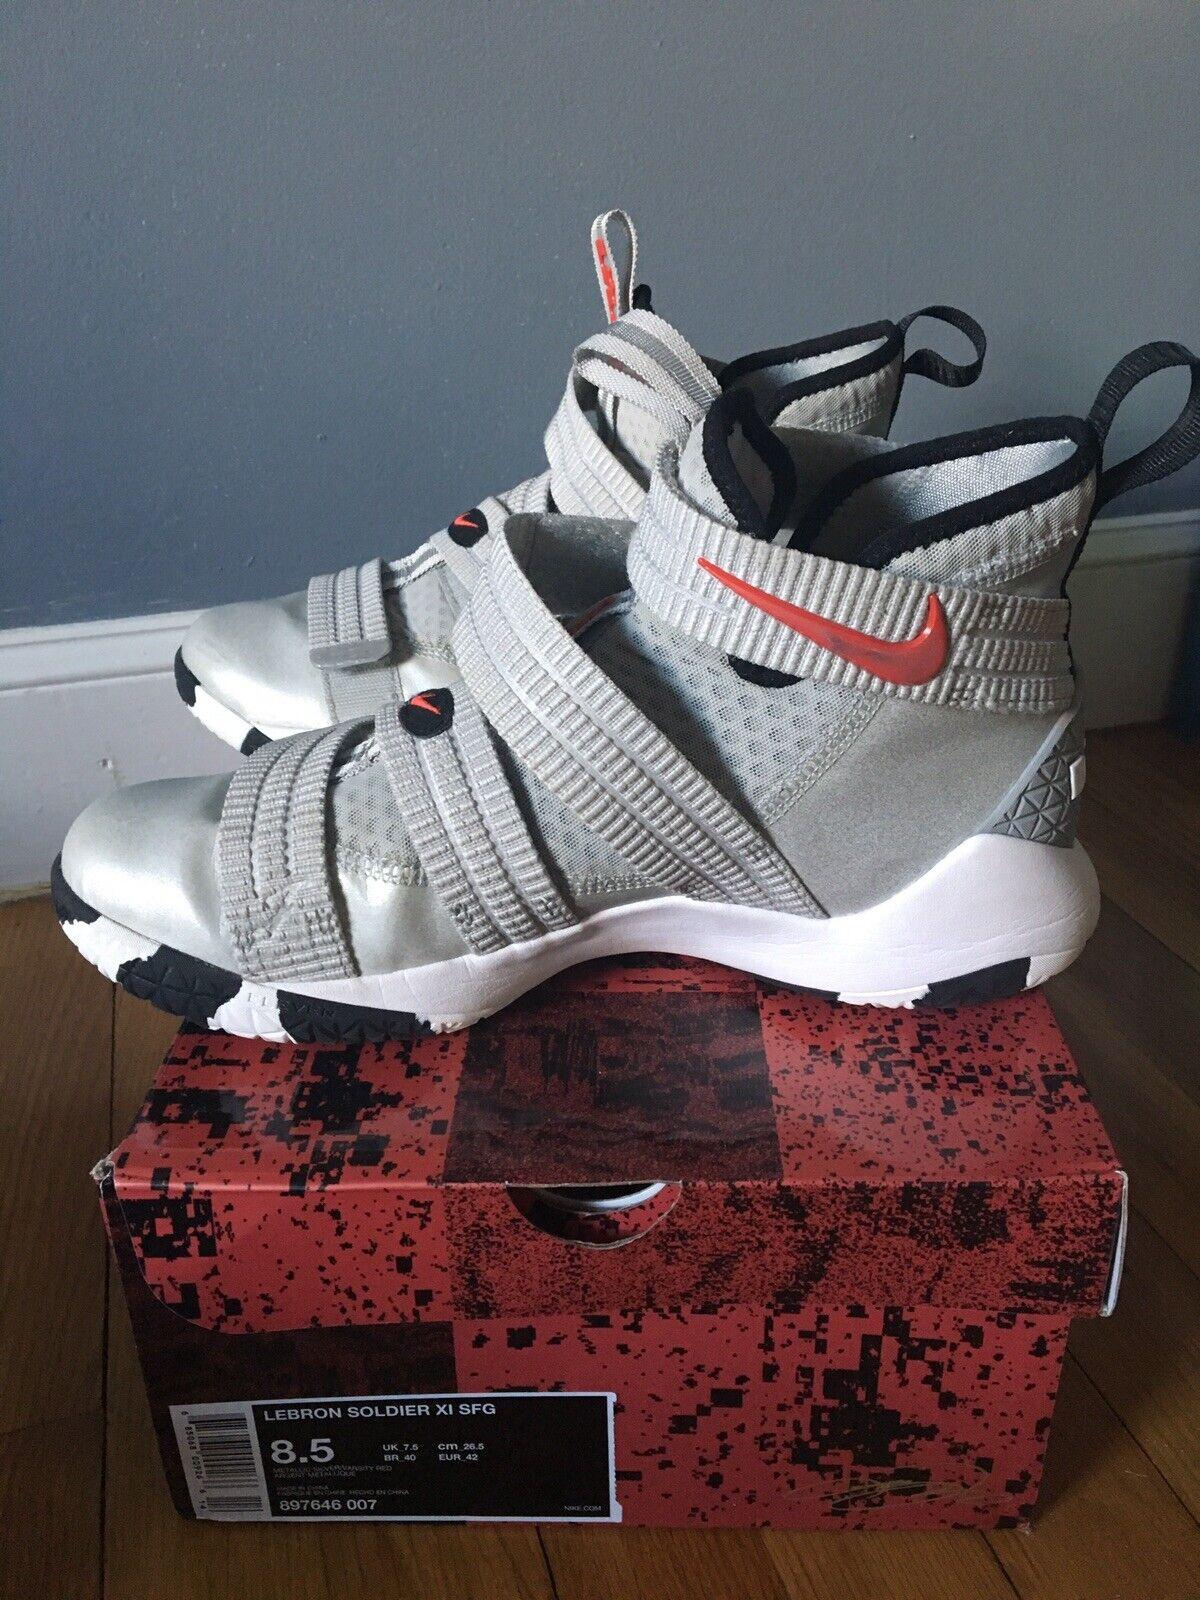 Nike LeBron Soldier X1 Men's Basketball shoes - Grey Size 8 1 2